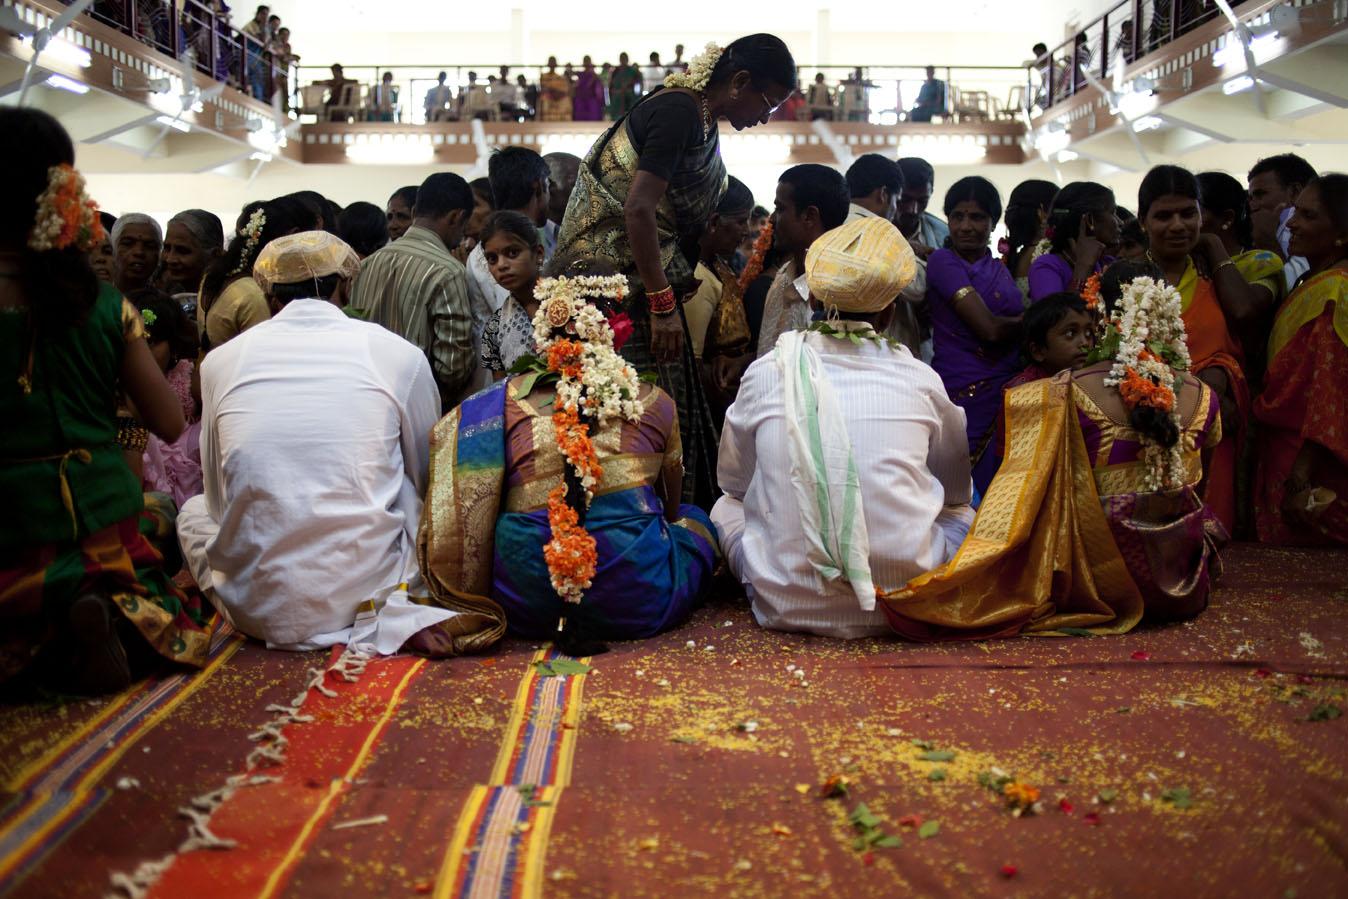 Becca_Ewing_India_wedding 5.jpg